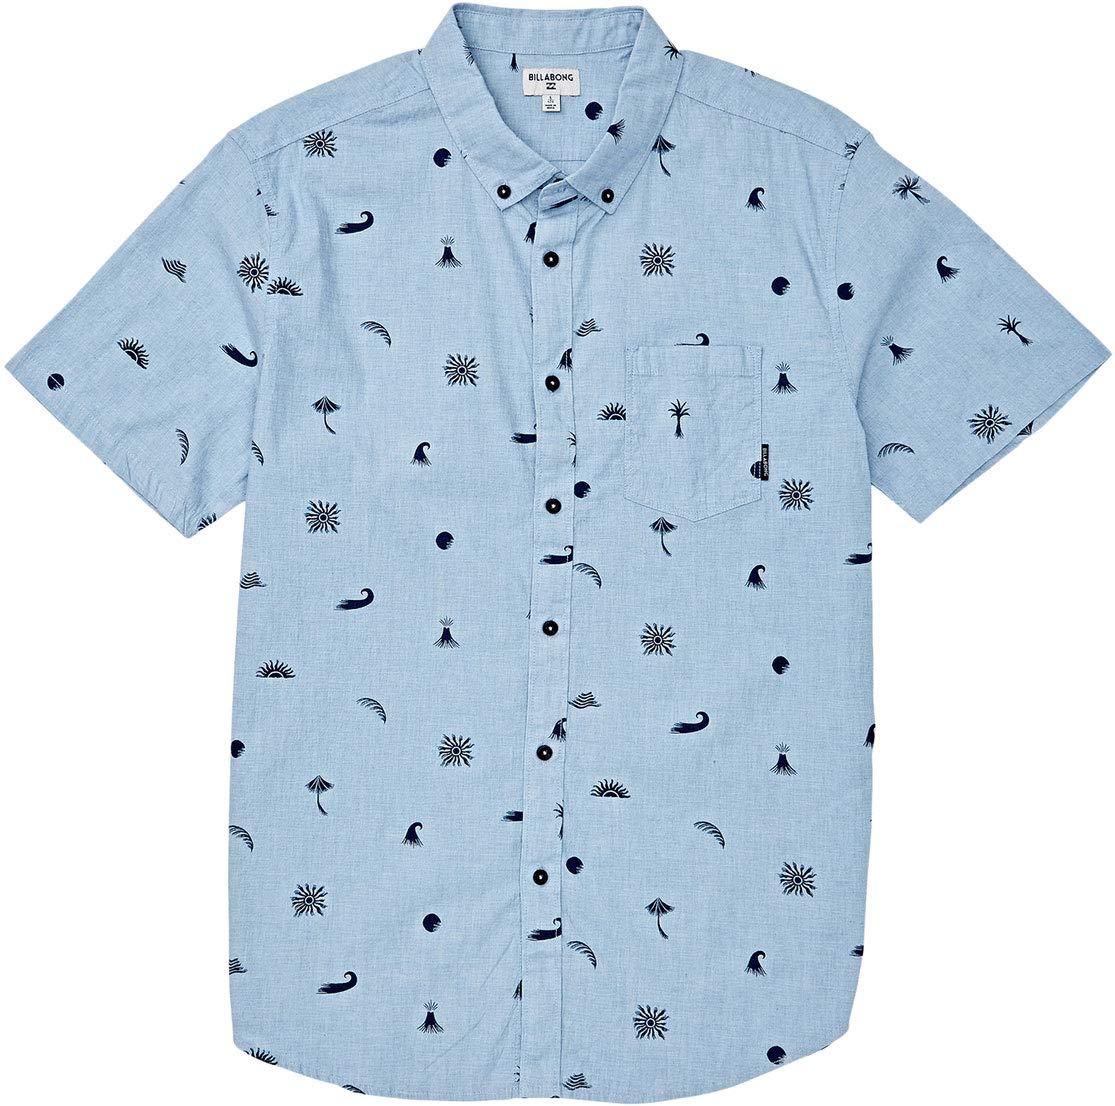 Billabong Men's Sundays Mini Short Sleeve Shirt Blue Large